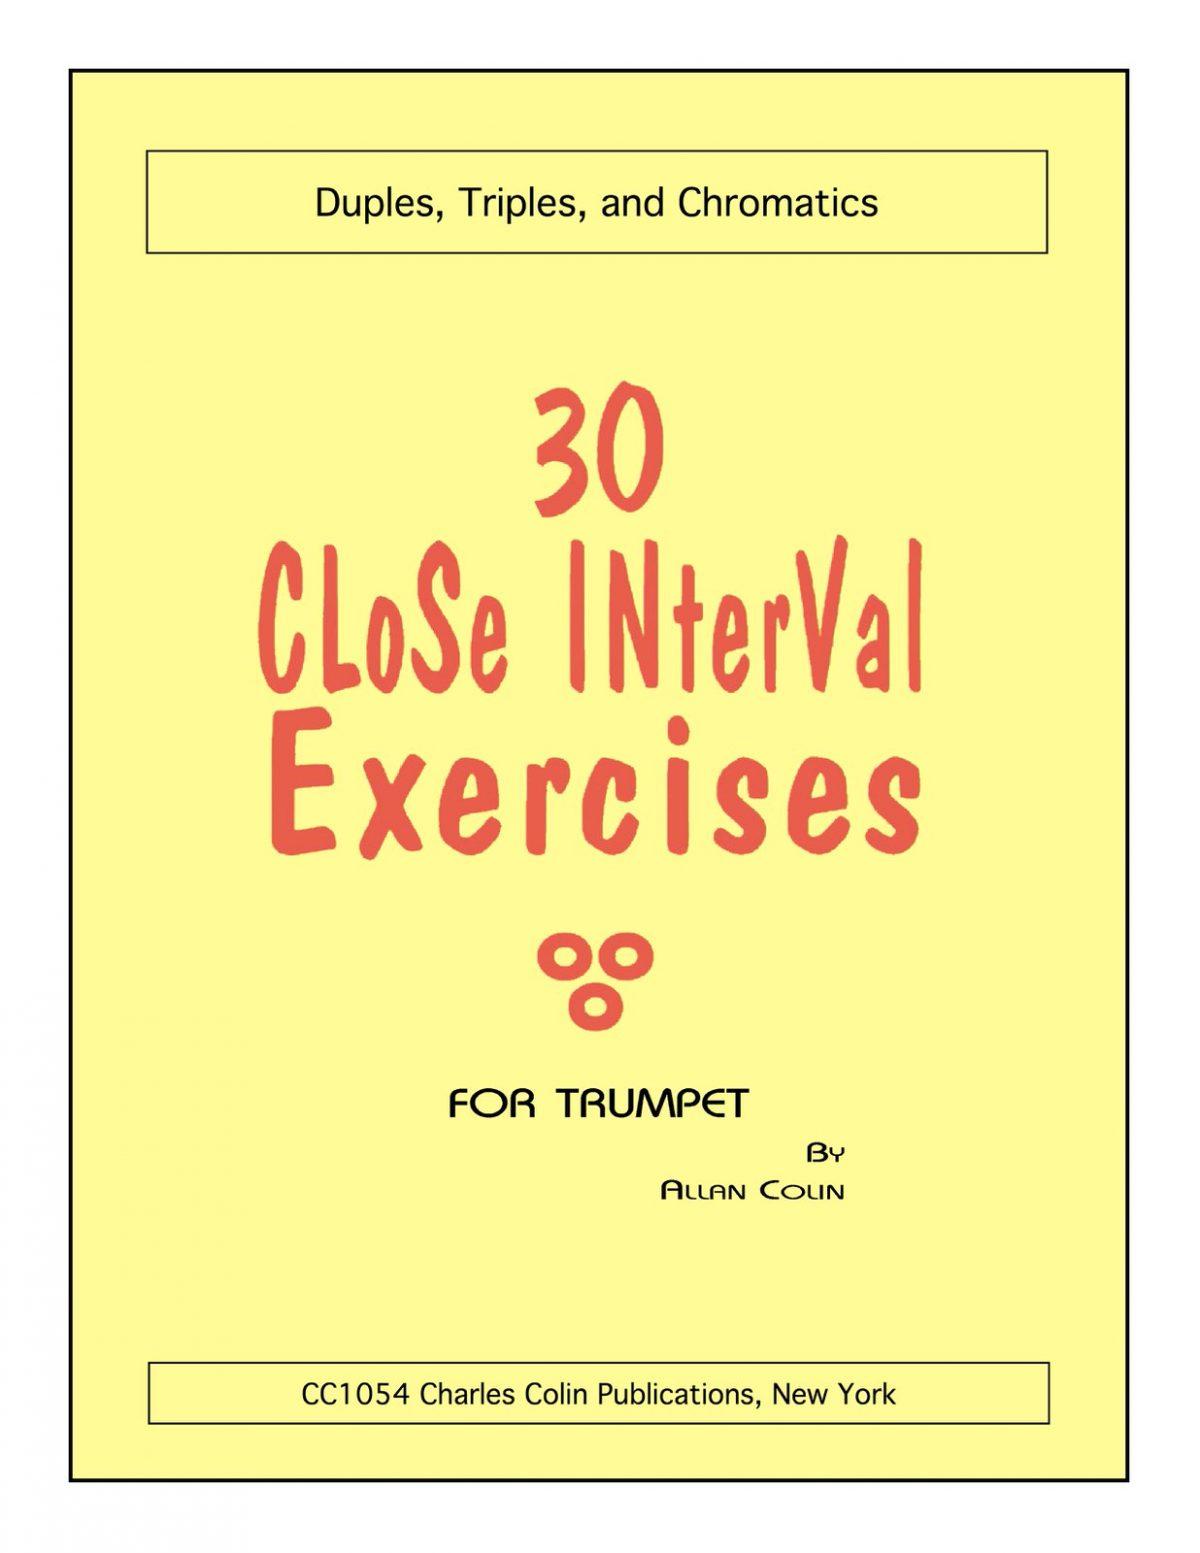 Colin, 30 Close Interval Exercises-p01